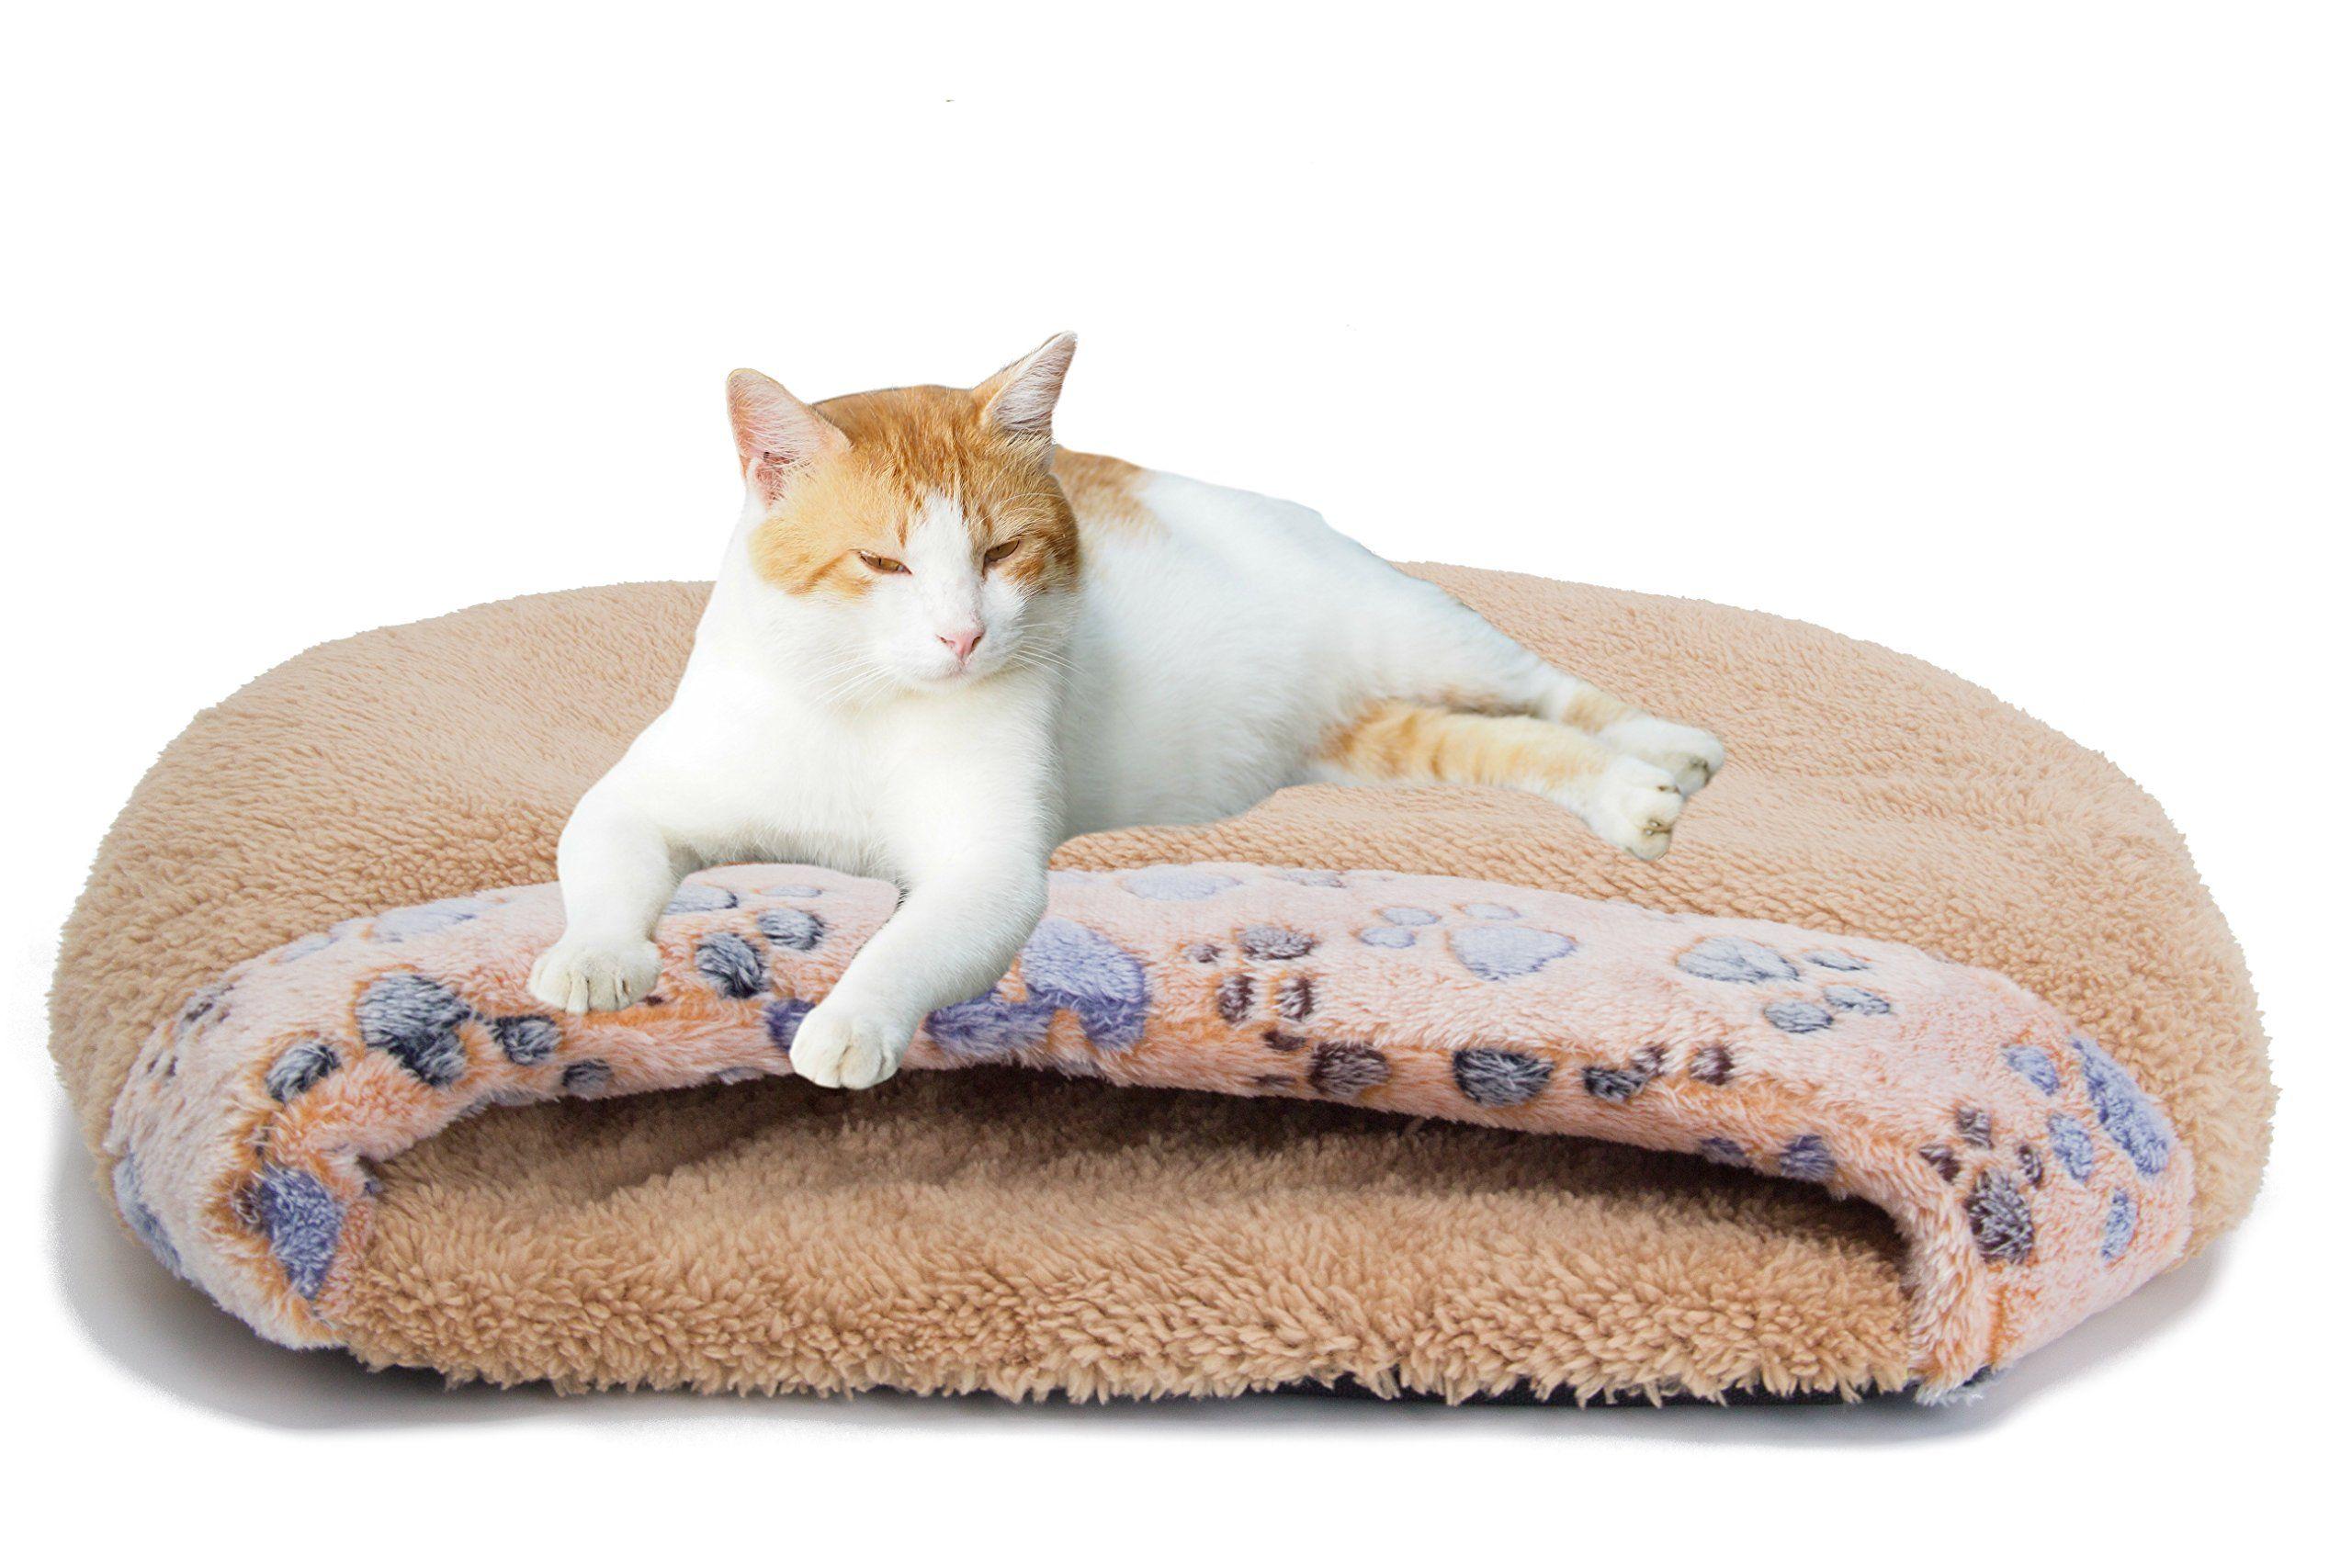 Miluck Pet Cat Bed Cat Sleeping Bag Soft Warm Windproof Waterproof Pet Bed House For Dog Cat Kitten Indoor Outdoorsbrown W Cat Bed Cat Sleeping Dog House Diy